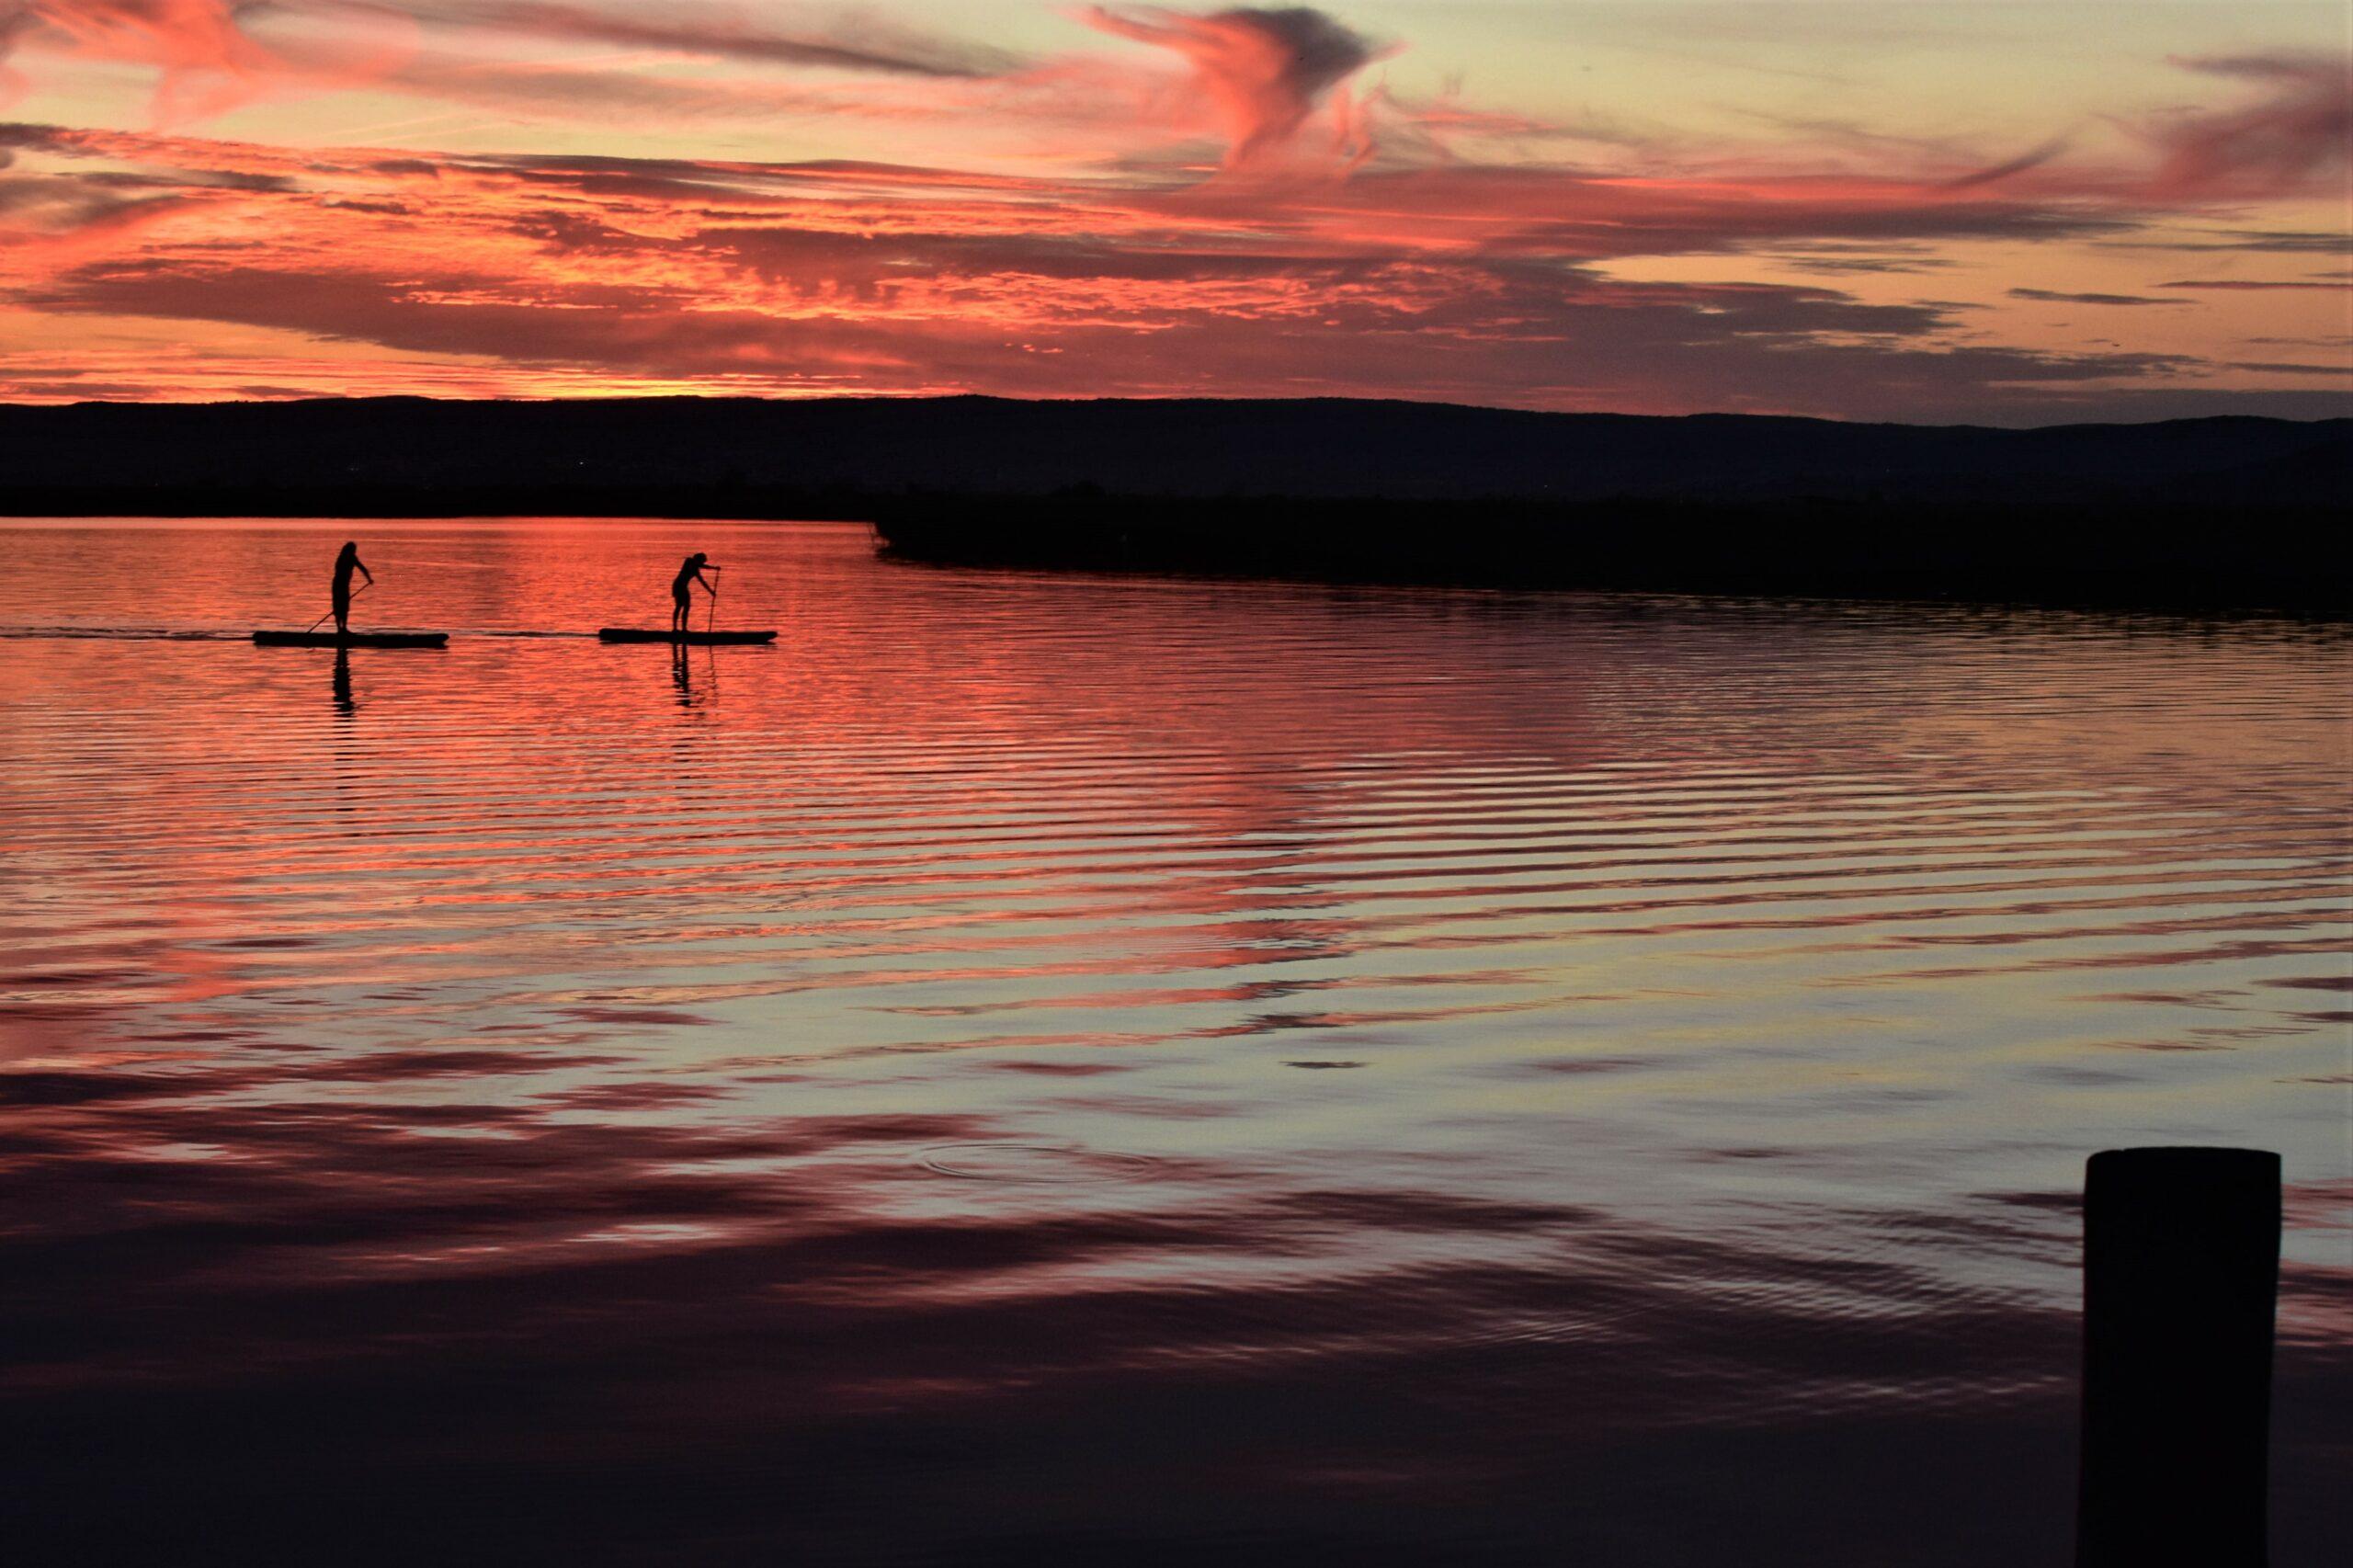 Sunset, Sonnenuntergang, See, rot